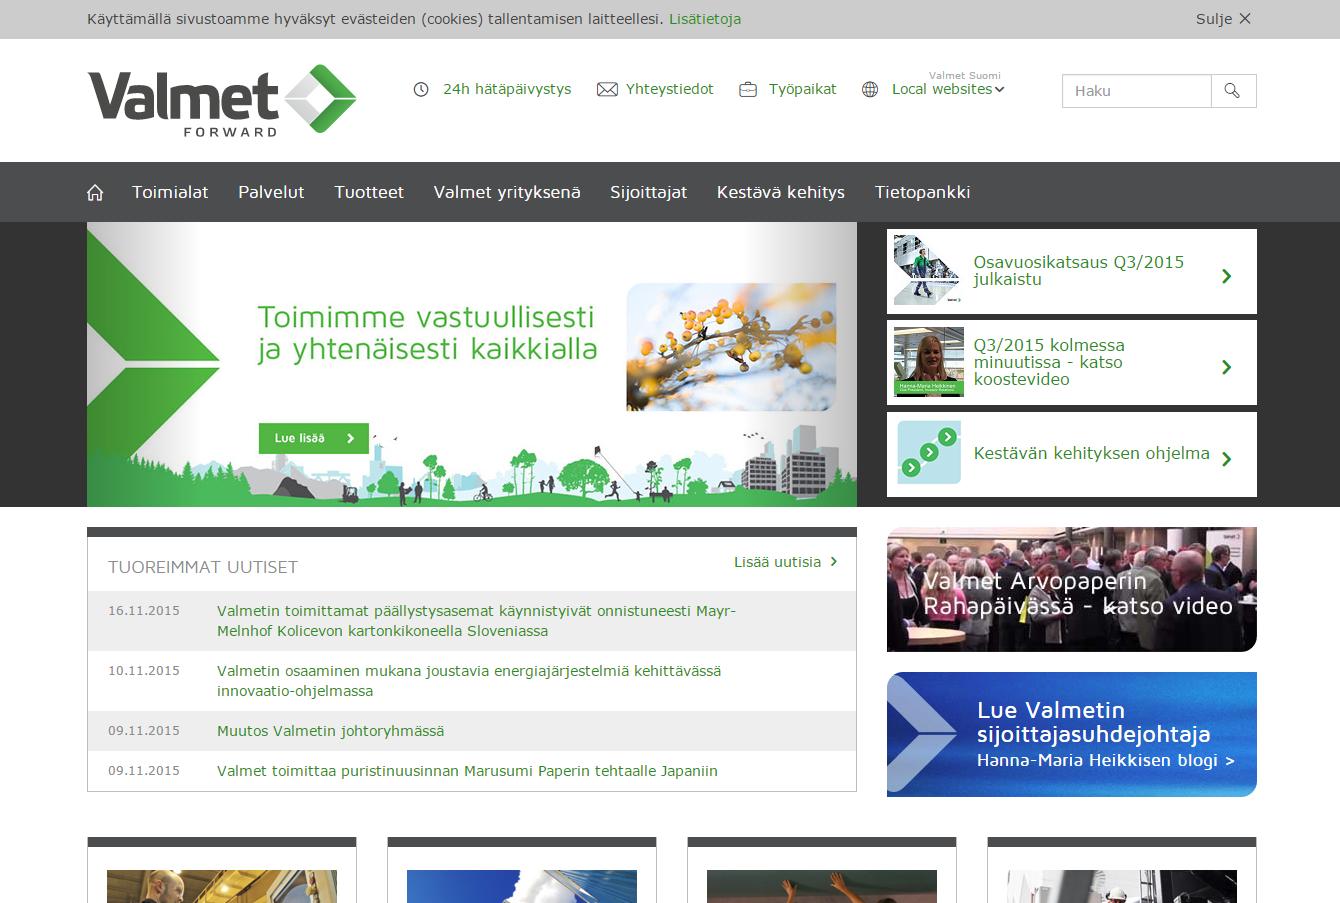 Etusivu Valmet.com